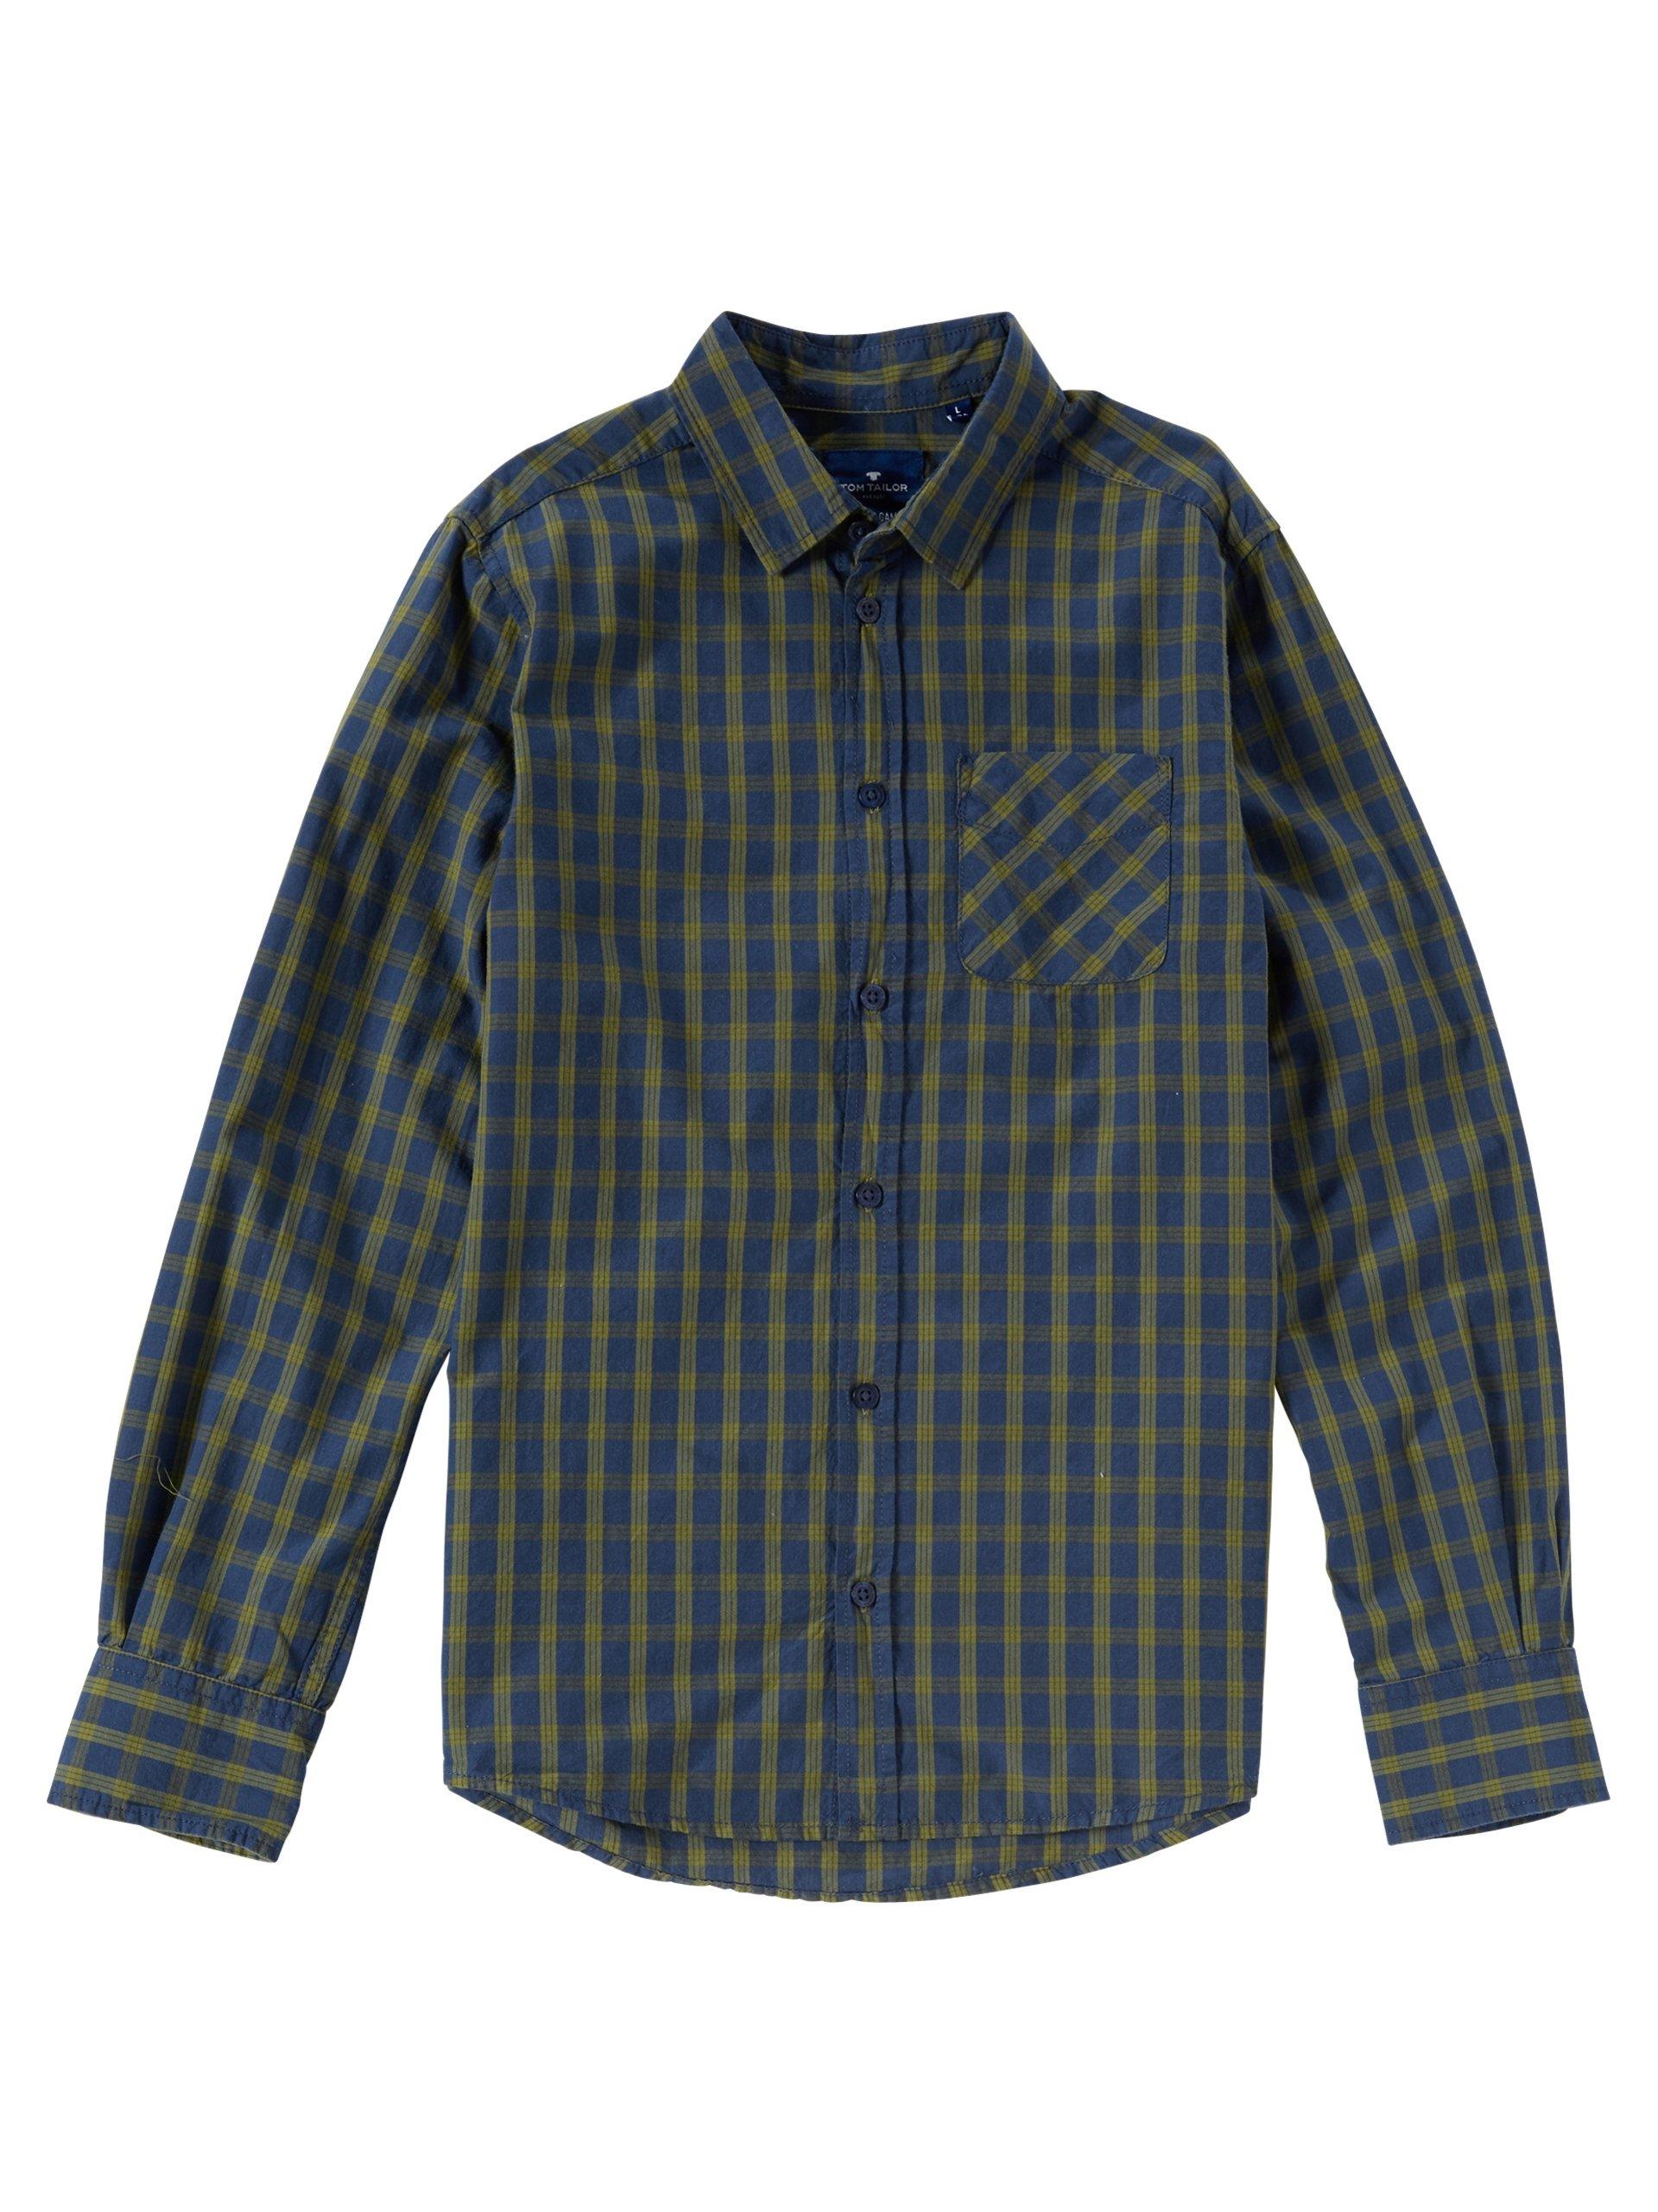 tom tailor jungen hemd oliv uni online kaufen peek und. Black Bedroom Furniture Sets. Home Design Ideas